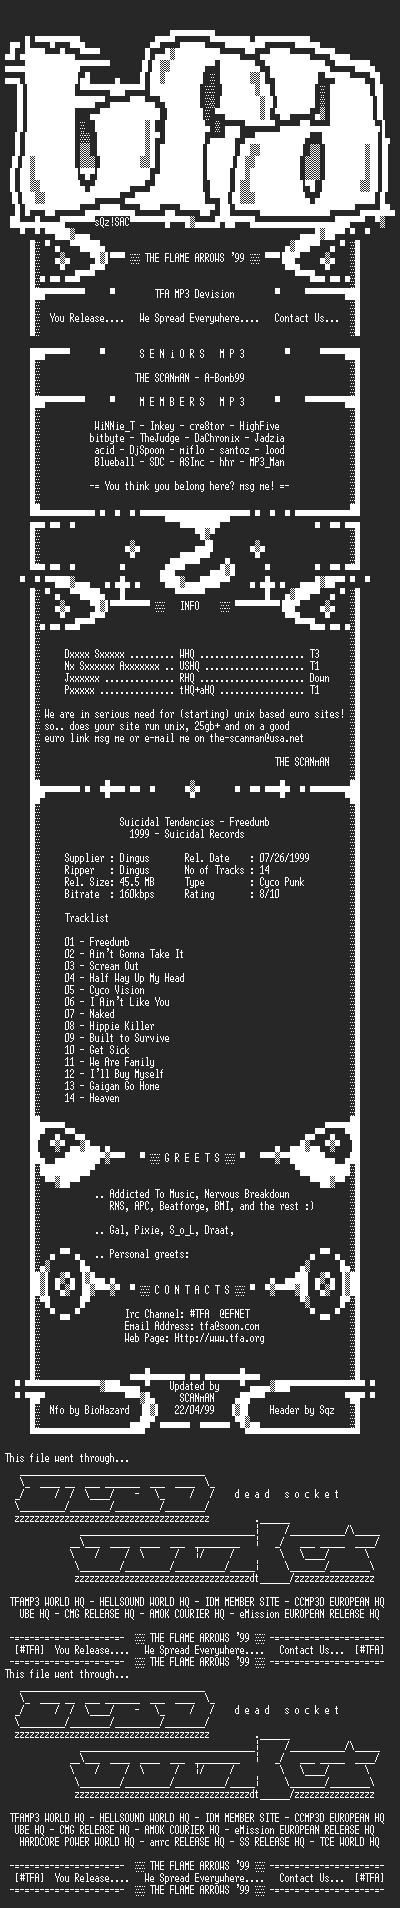 NFO file for Suicidal_Tendencies-Freedumb-1999-TFAMP3